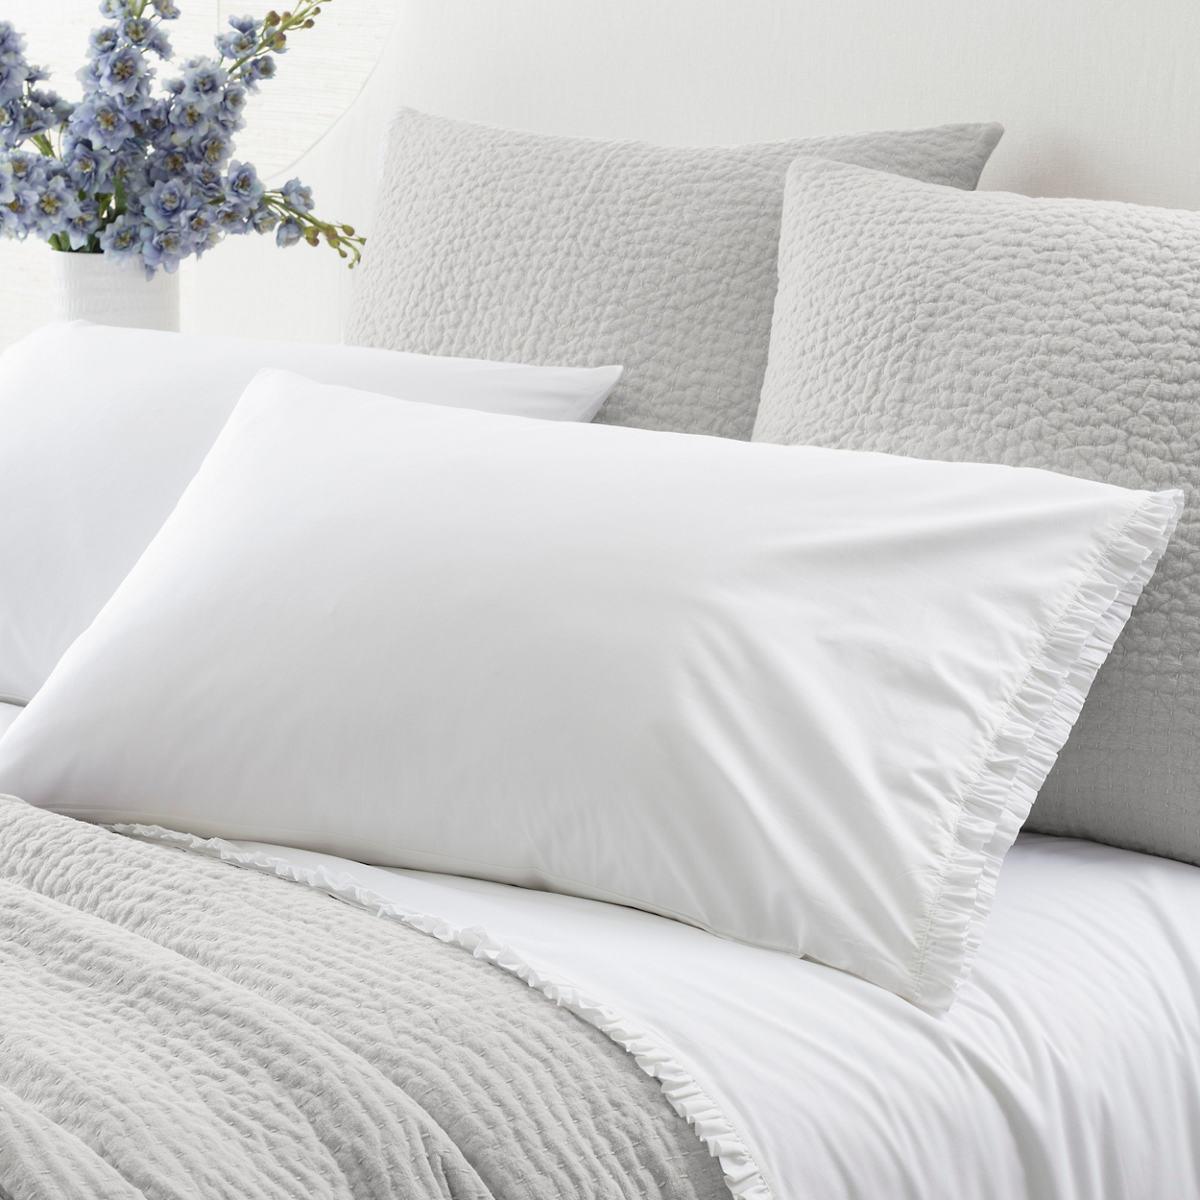 Classic Ruffle White Pillowcases (Pair)